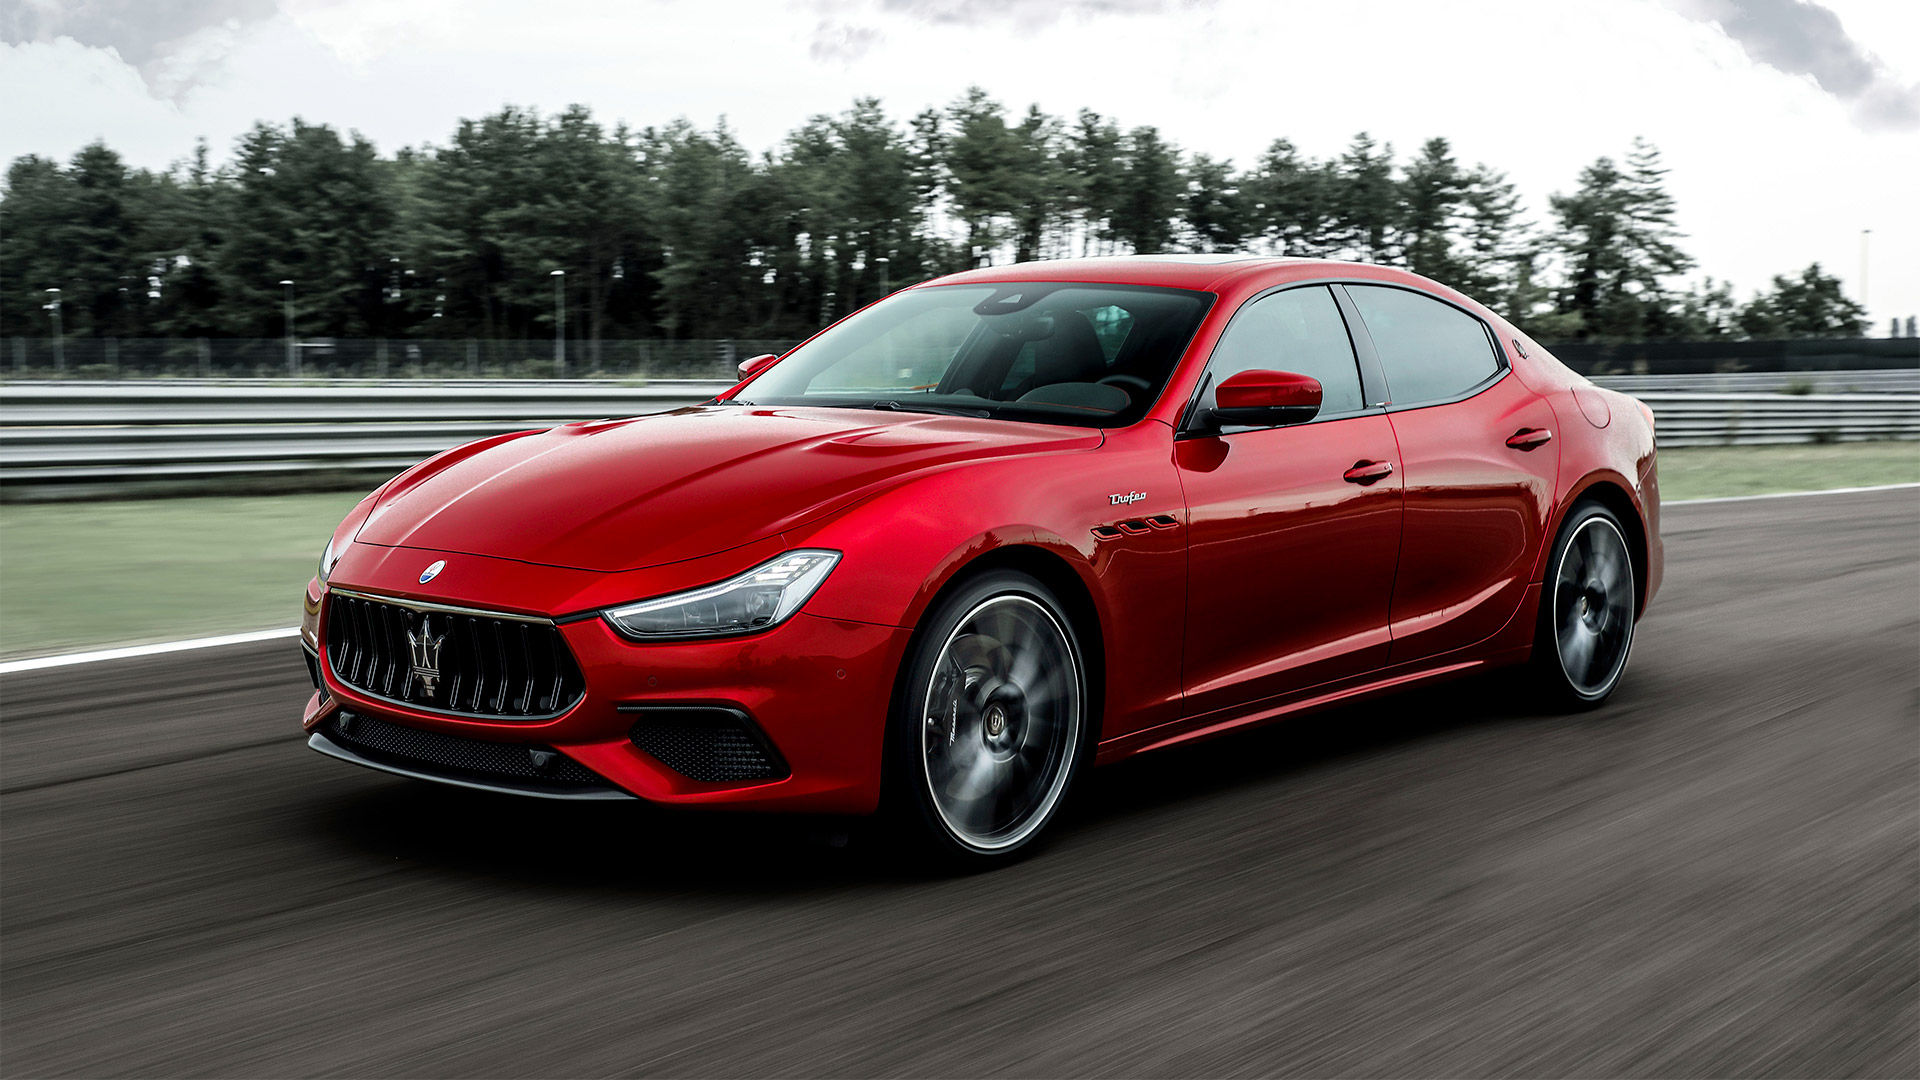 Maserati Ghibli Trofeo - Rot - fahrend auf der Straße